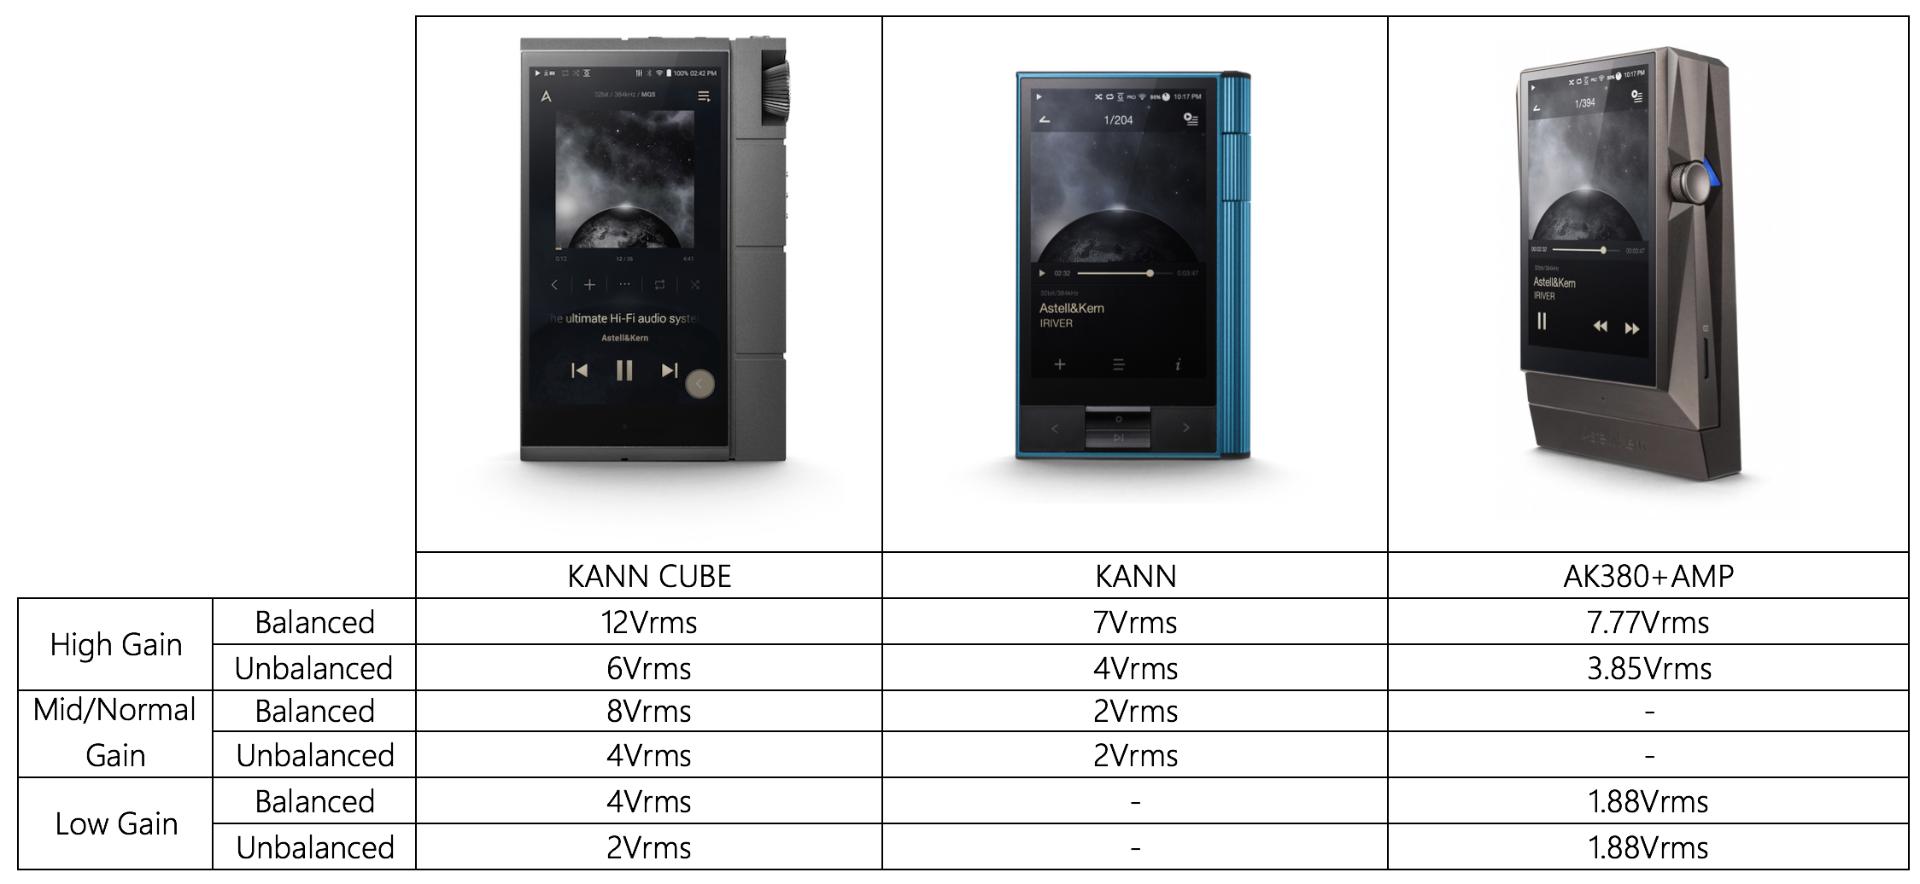 Output comparison of KANN CUBE, KANN, and AK380+Amp